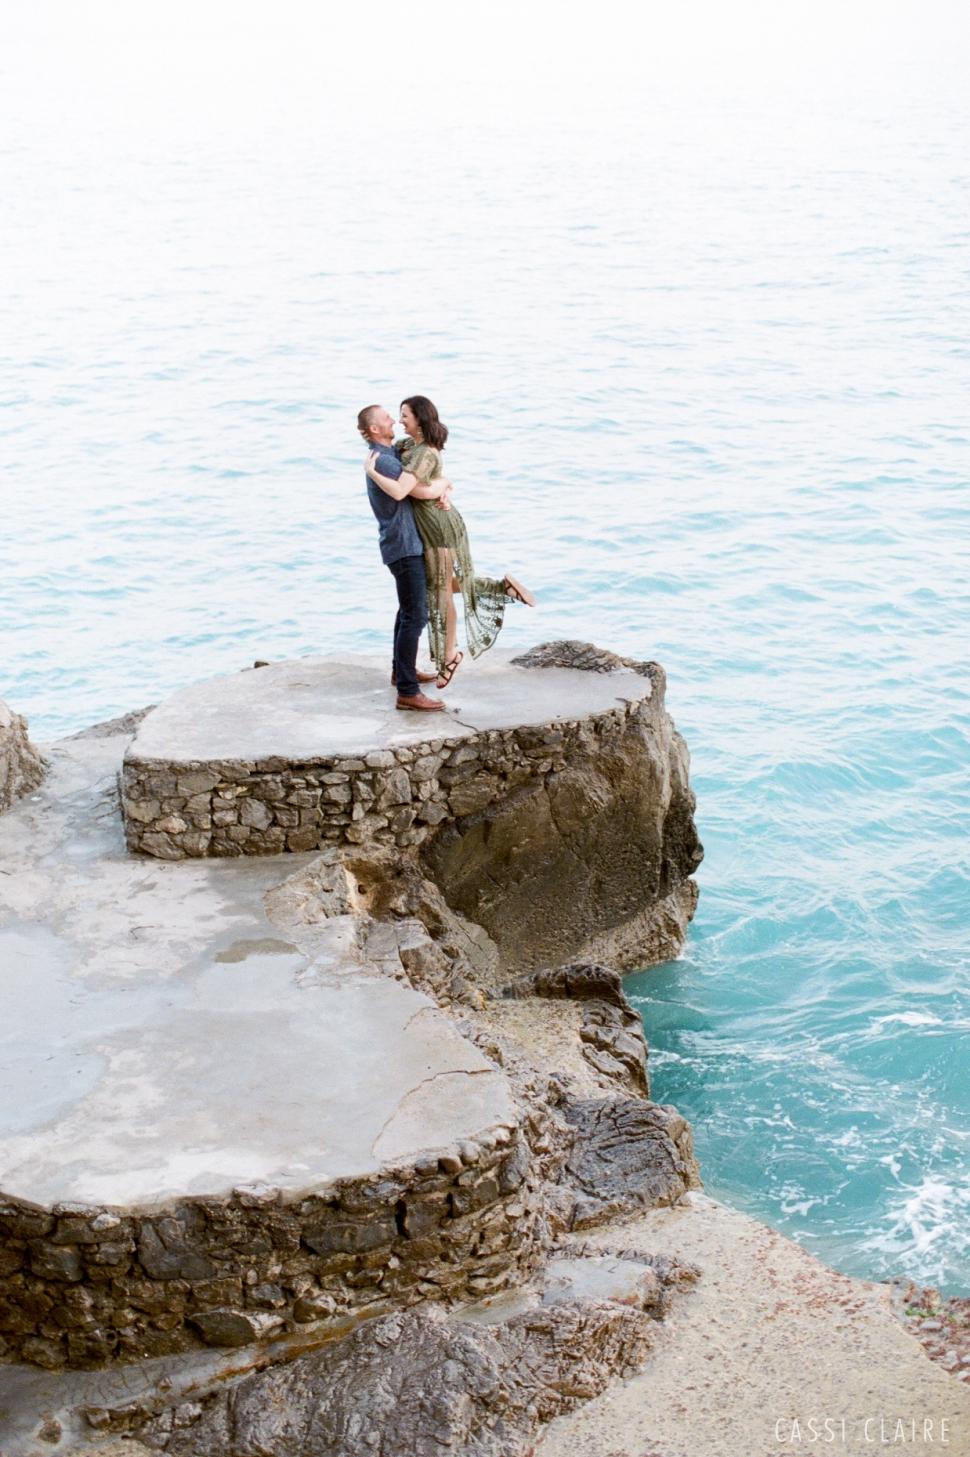 Positano-Anniversary-Photos_CassiClaire_26.jpg